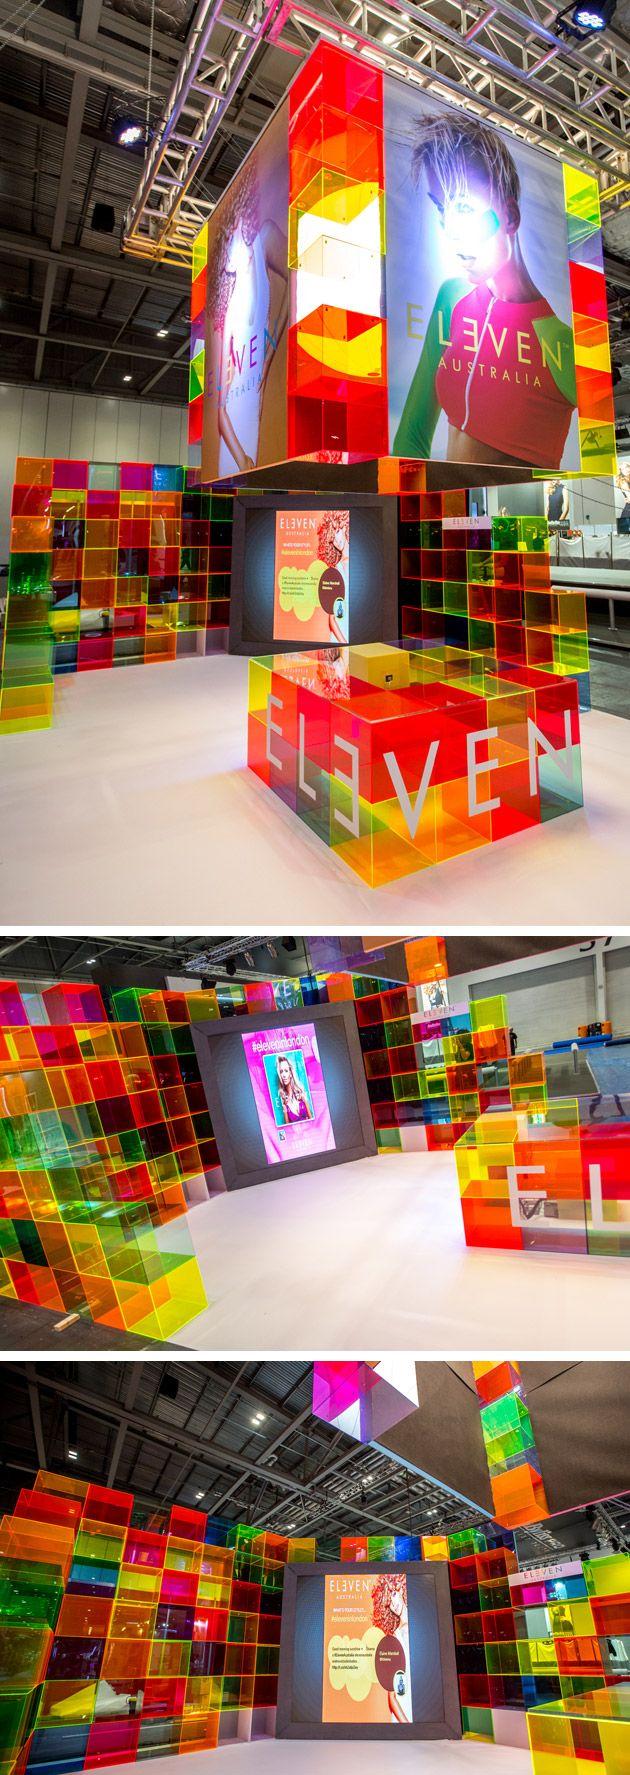 Expo Stands Australia : Eleven australia exhibition stand exhibition design exhibition